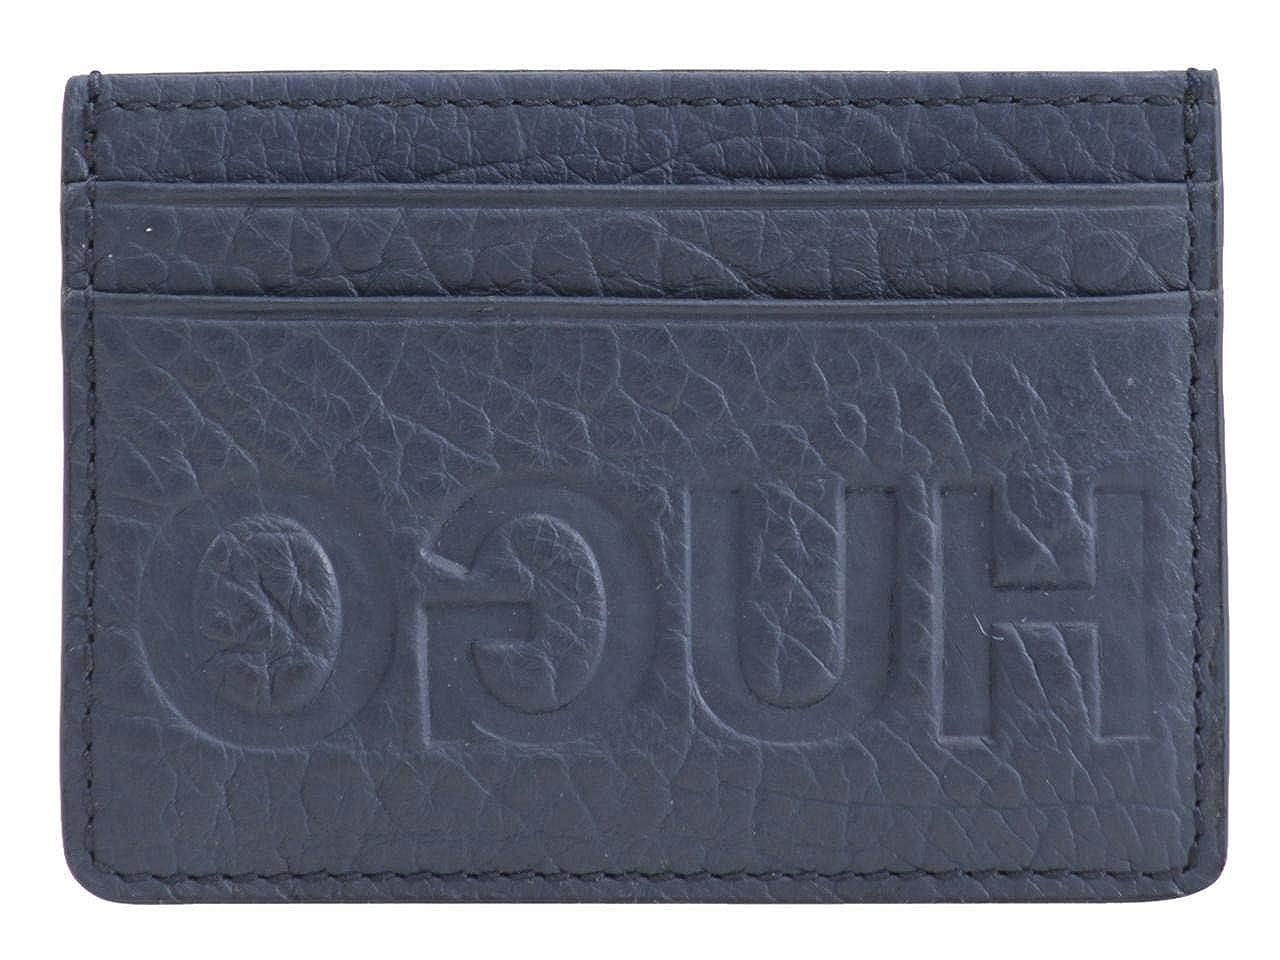 Hugo Boss mens standard Victorian Hugo Logo Leather Card Holder Dark Blue One Size HUGO by Hugo Boss 50402993